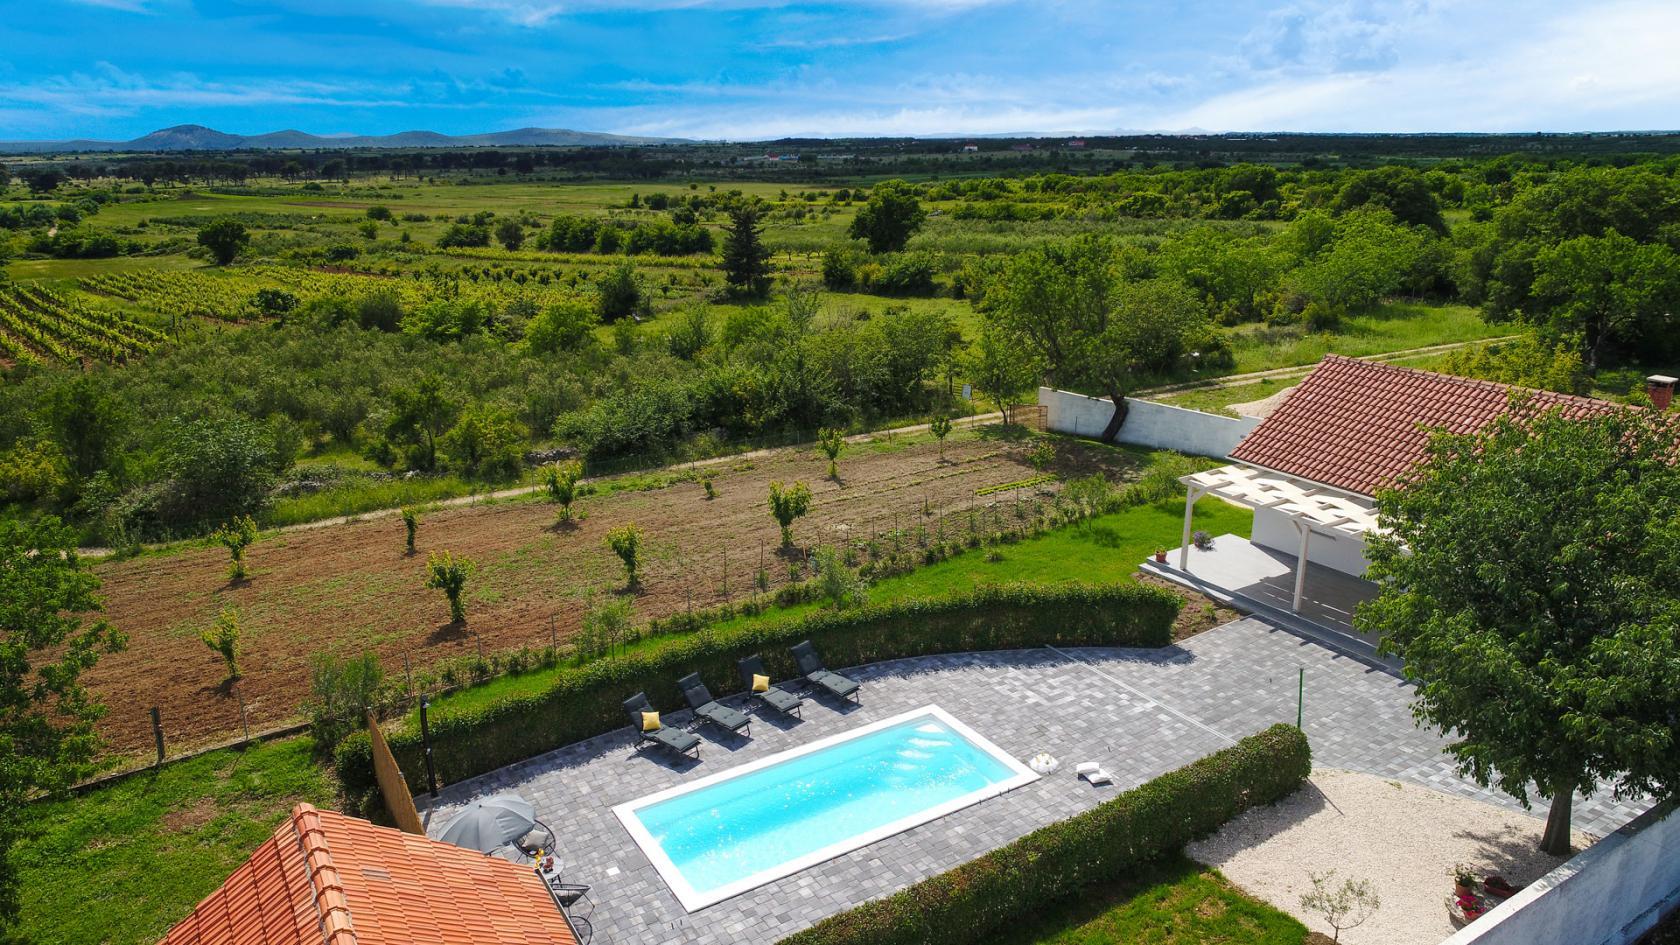 villa, andu, škabrnja, privacy, vineyards, olives, fields, zadar, croatia, www.zadarvillas.com